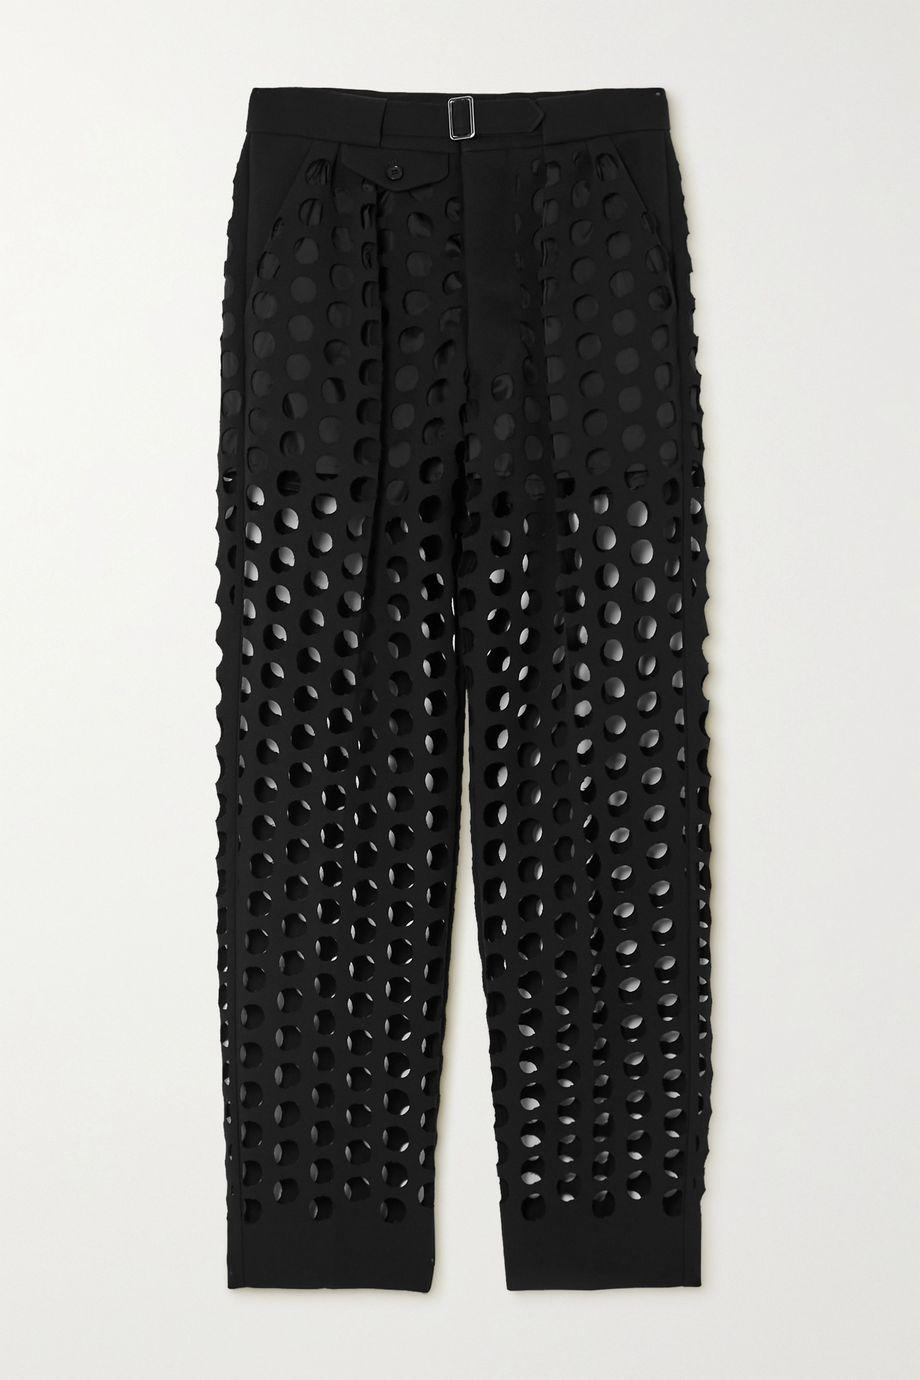 Maison Margiela Pleated laser-cut crepe straight-leg pants